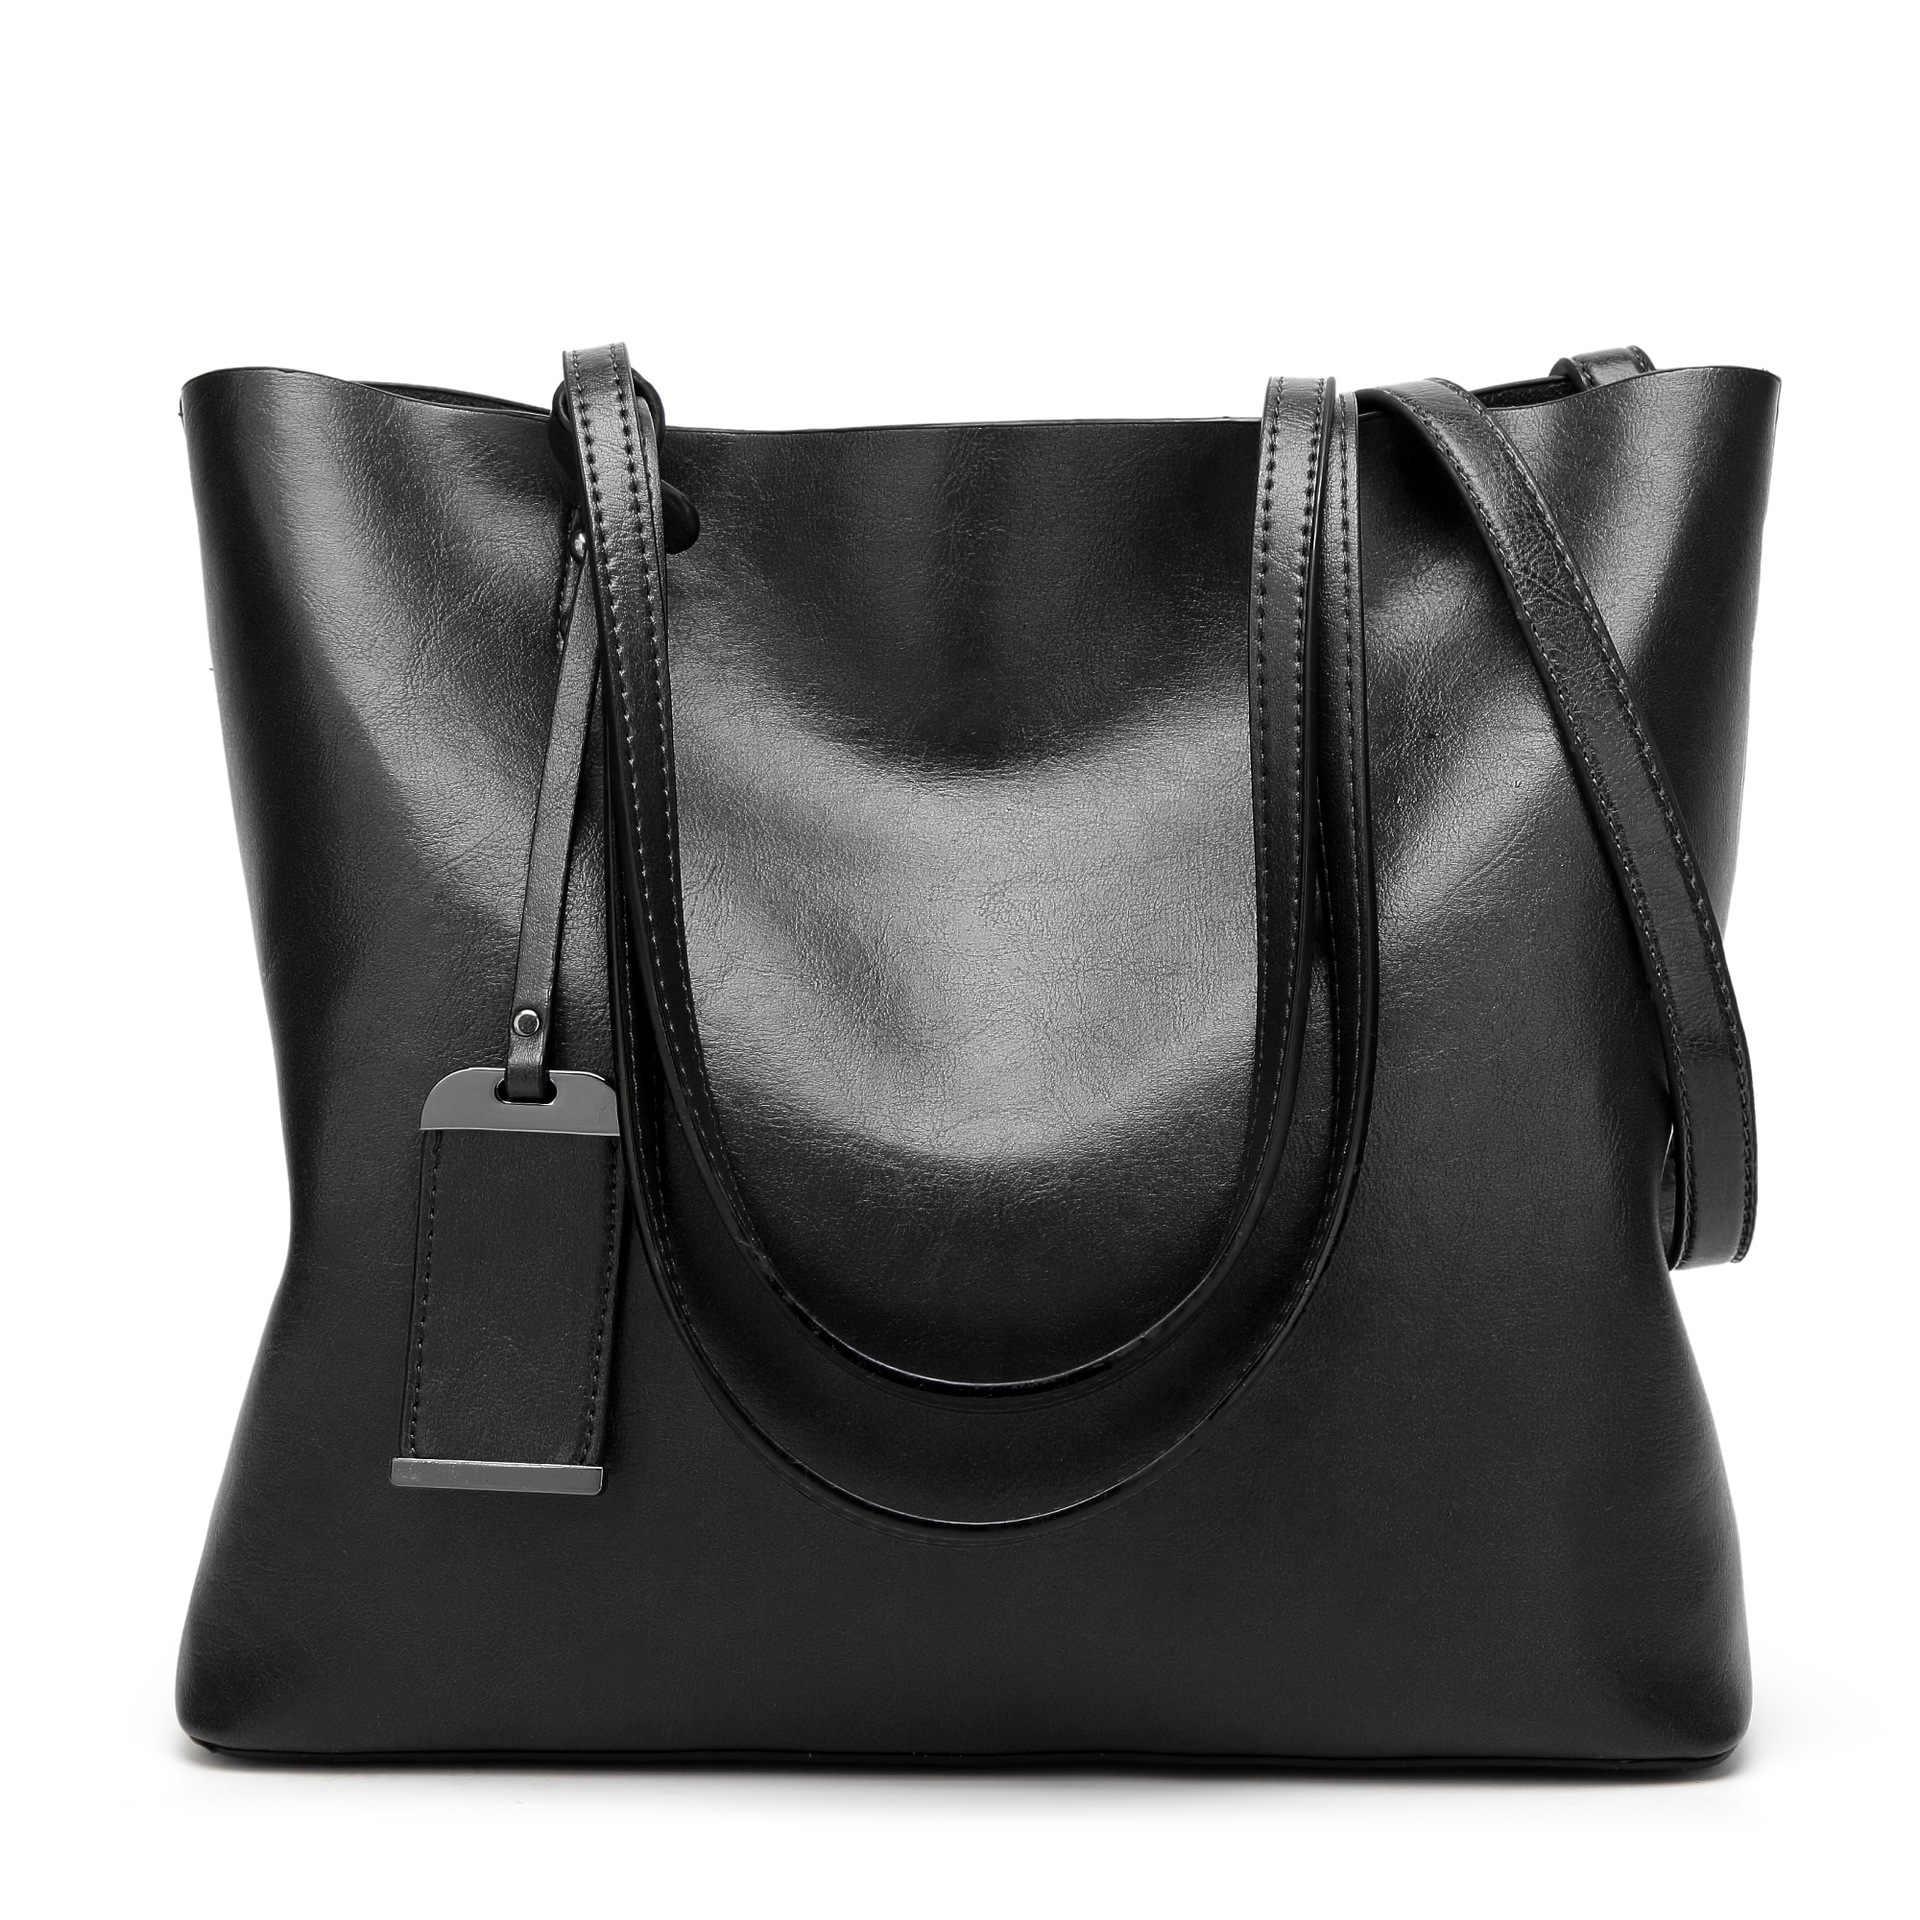 Sac a principal femme bolsas de luxo bolsas femininas designer de couro macio bolsa de ombro das senhoras borla bolsa moda c1079